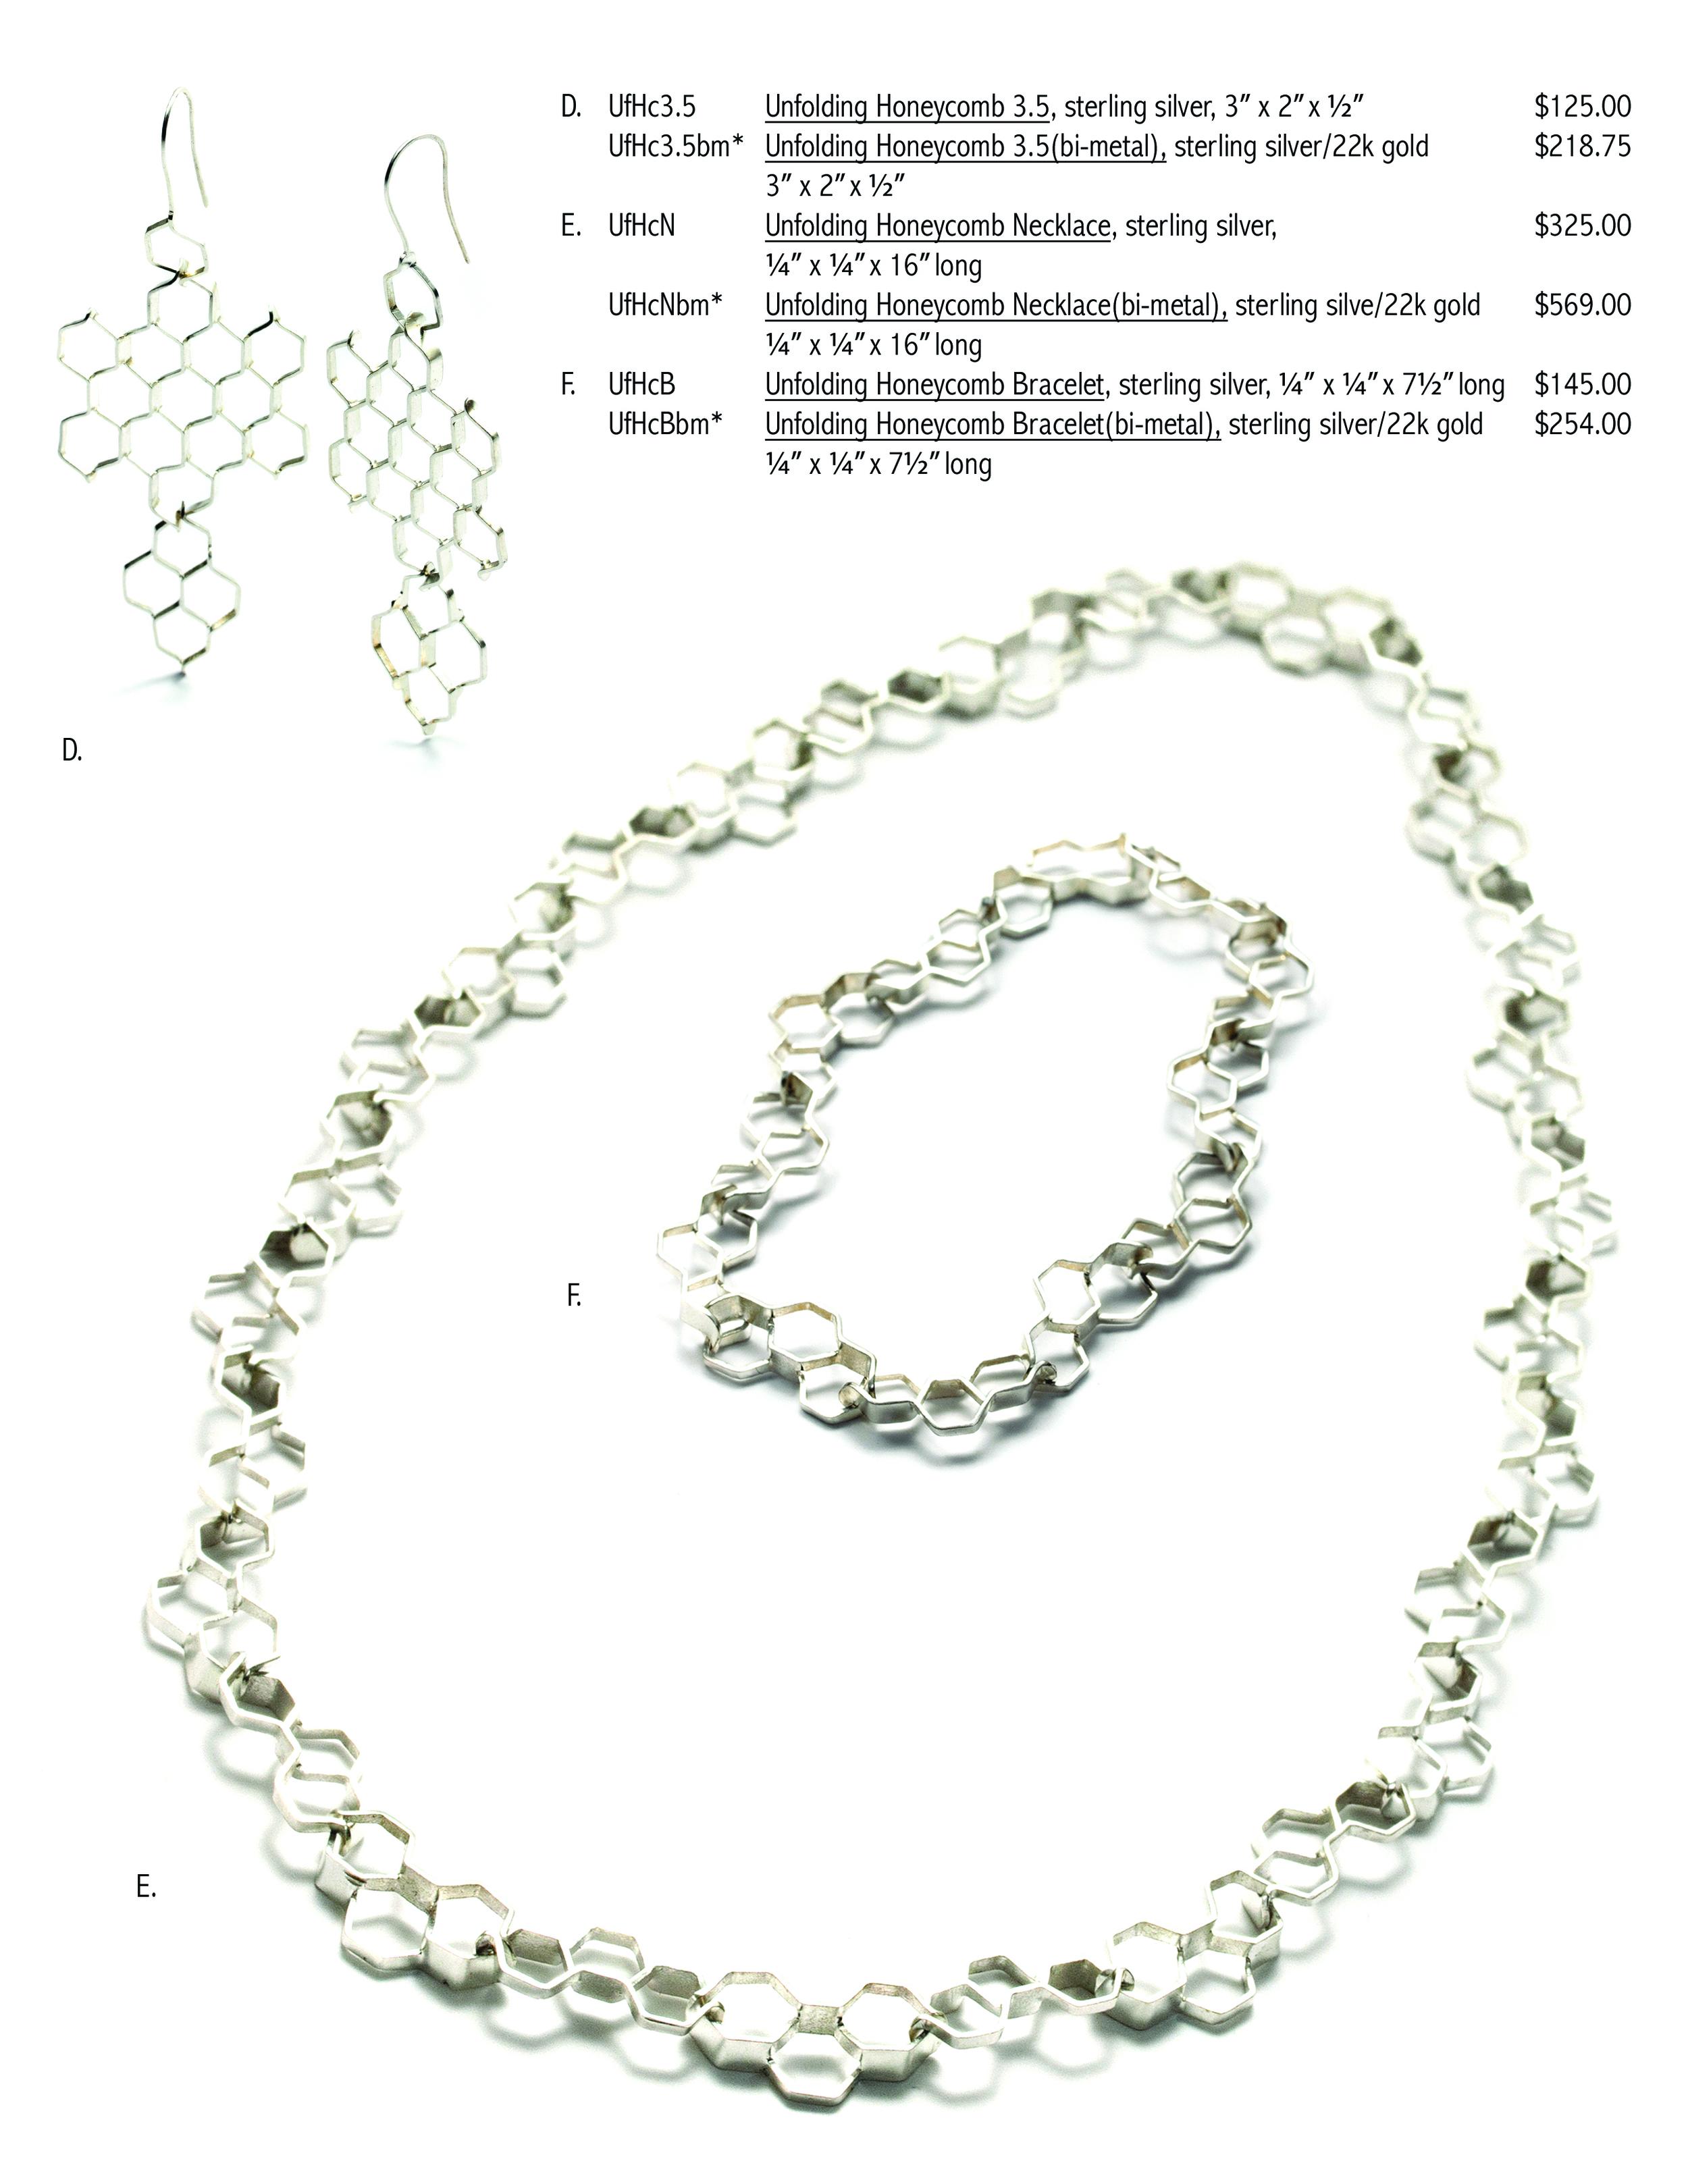 catalogue pg 6.jpg